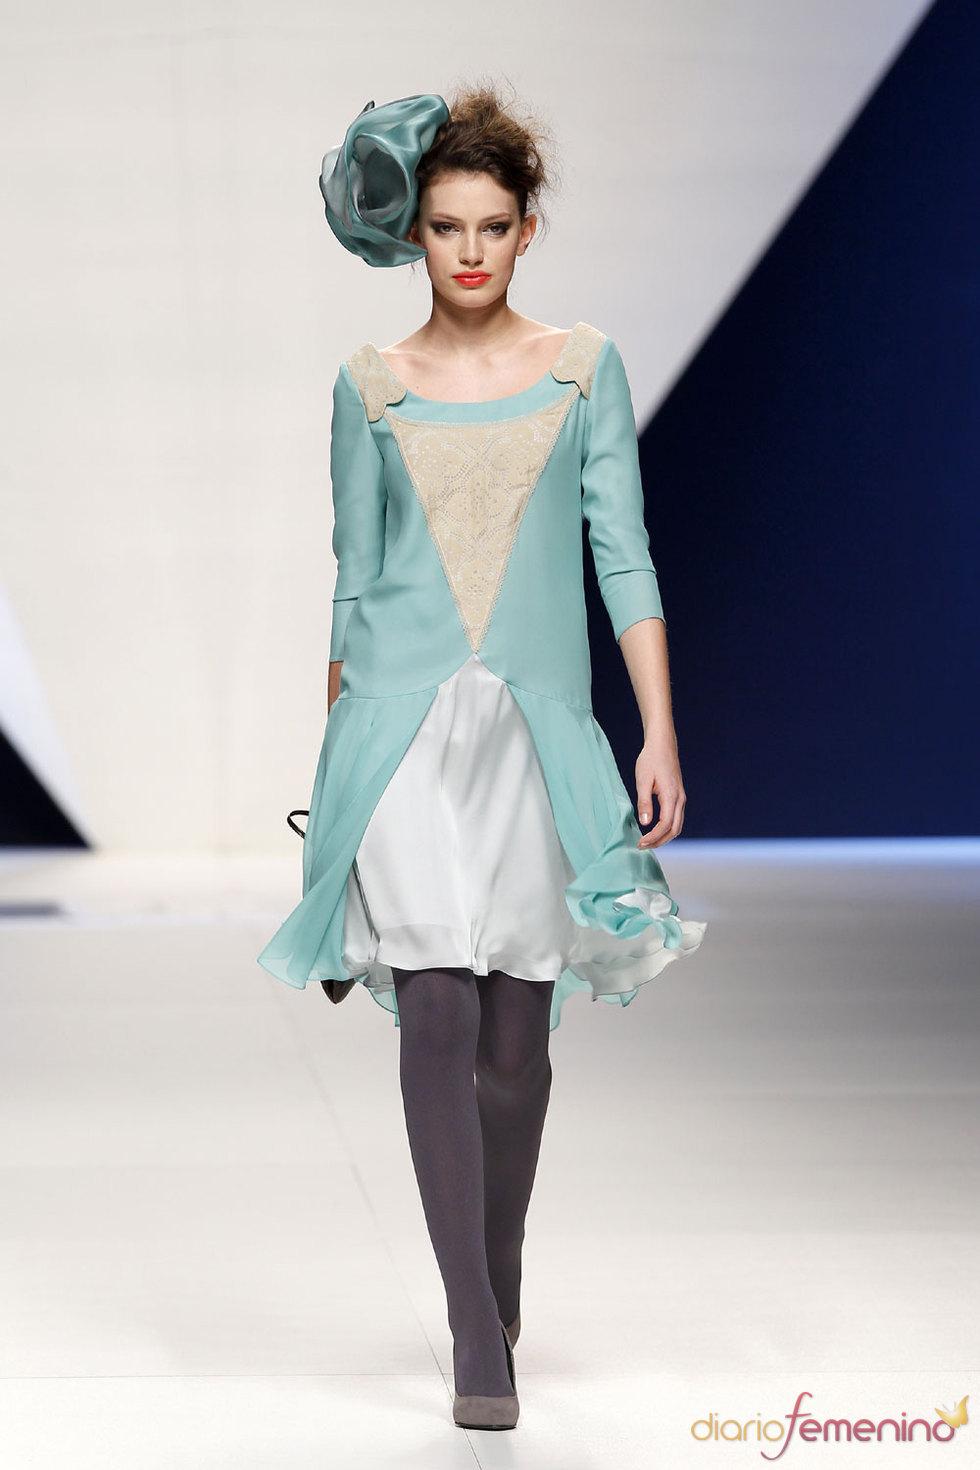 BEBA'S CLOSET - Cibeles Madrid Fashion Week Feb 2010